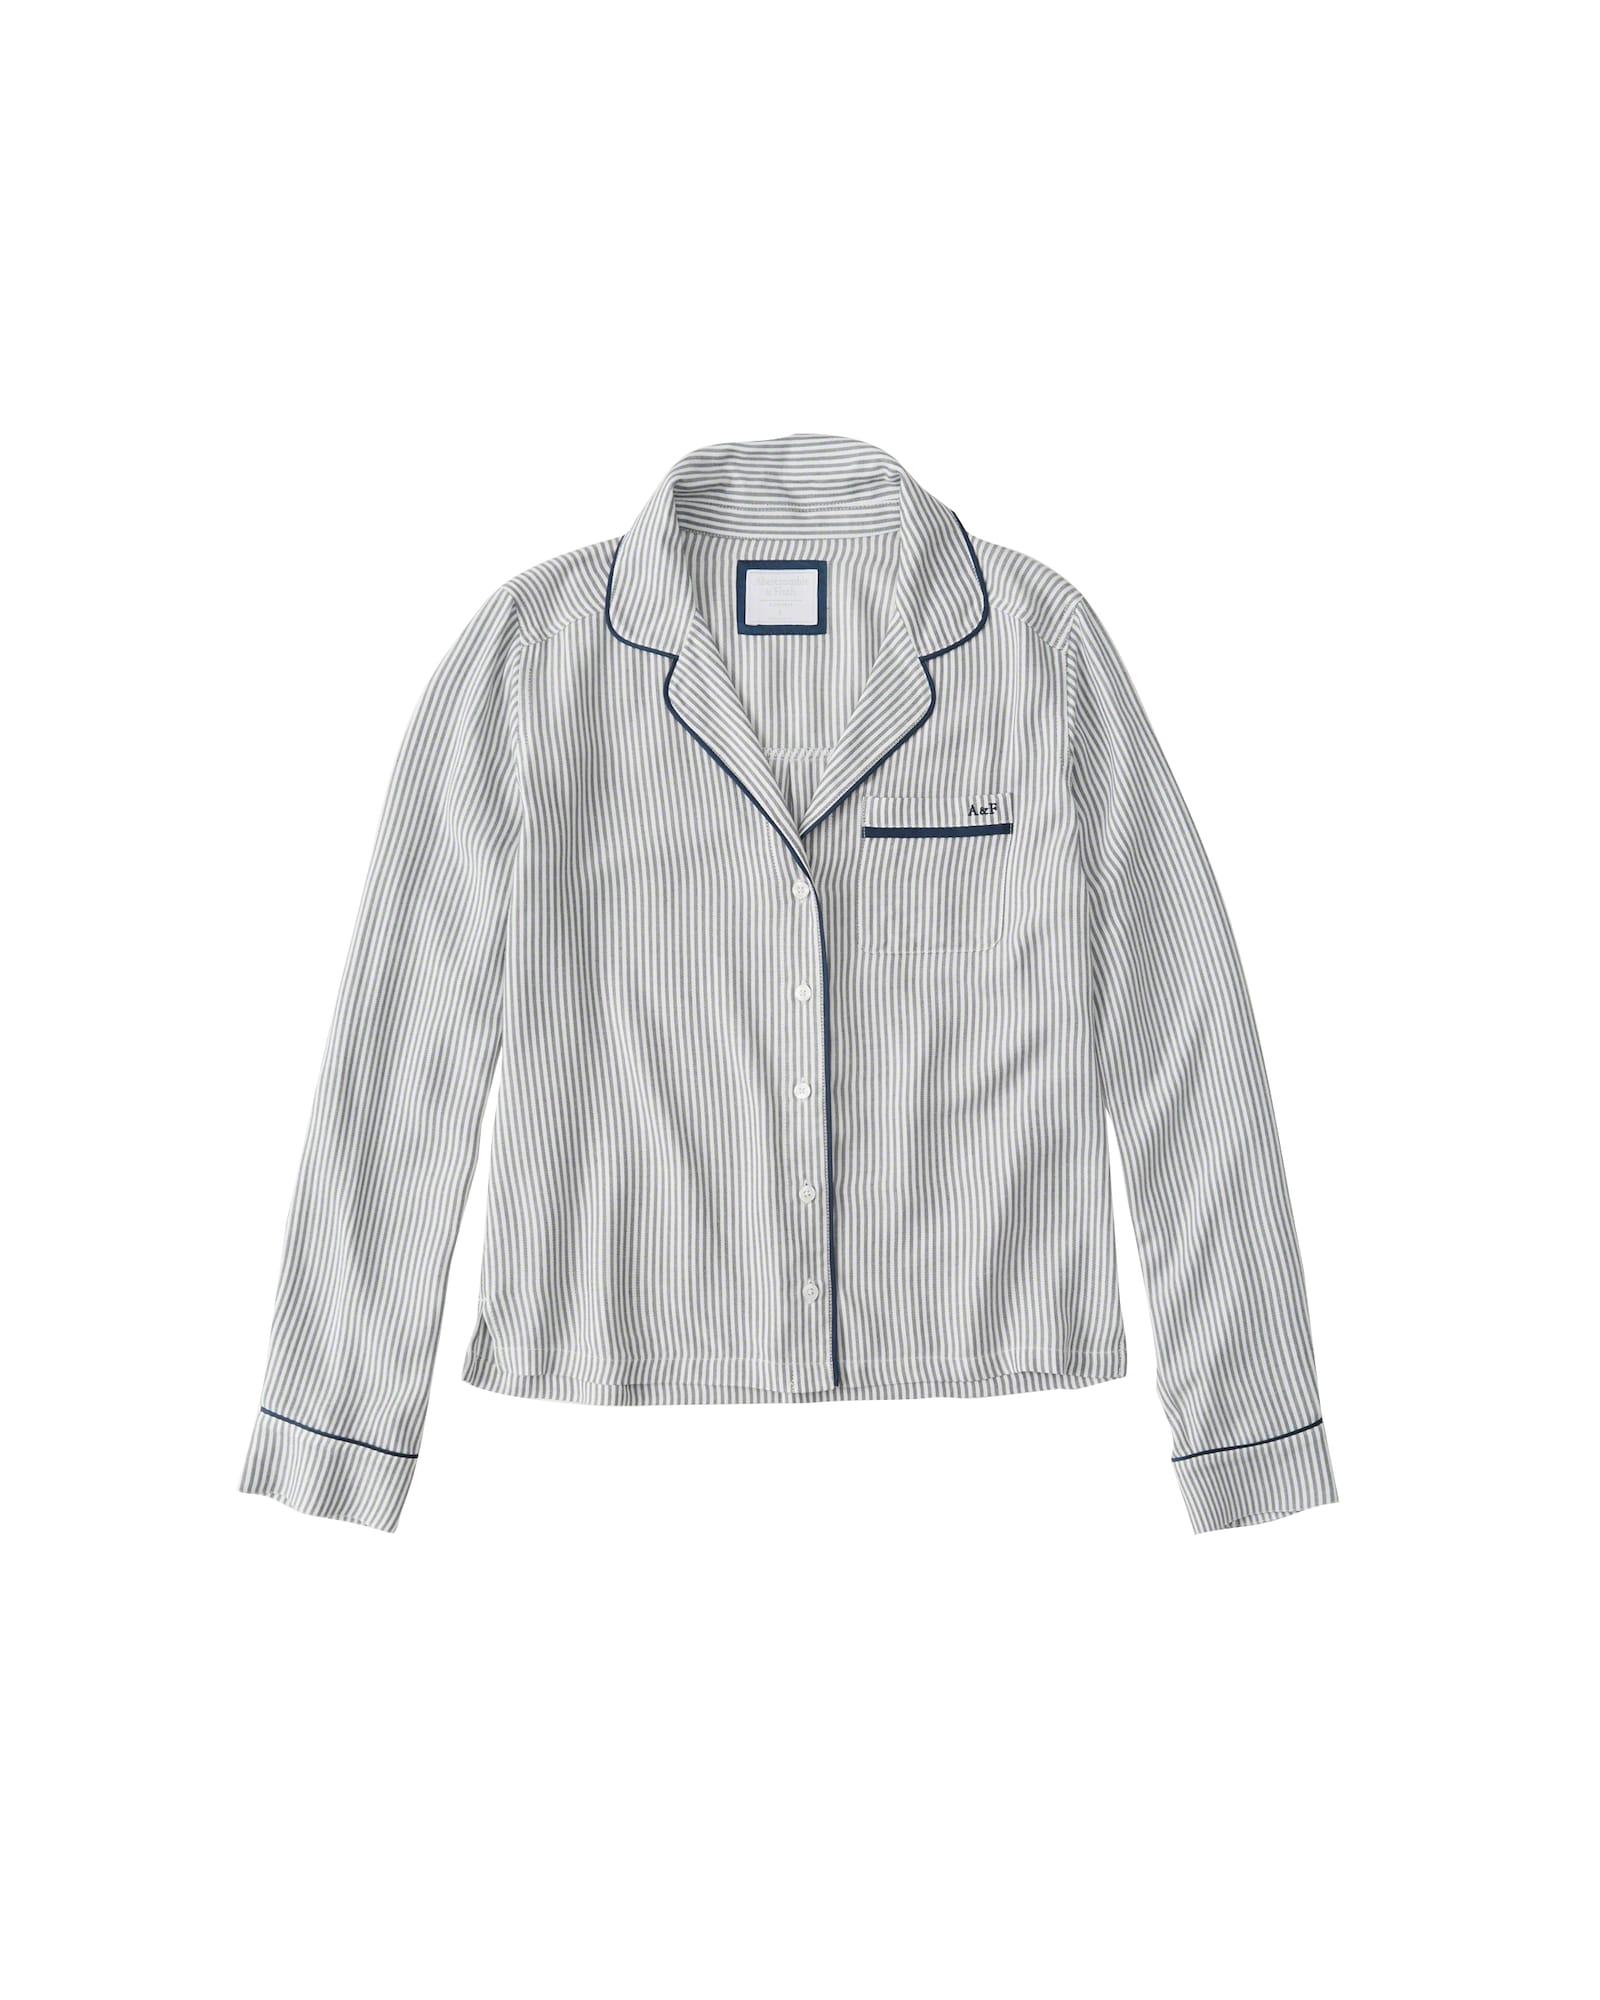 Tričko na spaní MENSWEAR LS SHIRT modrá bílá Abercrombie & Fitch